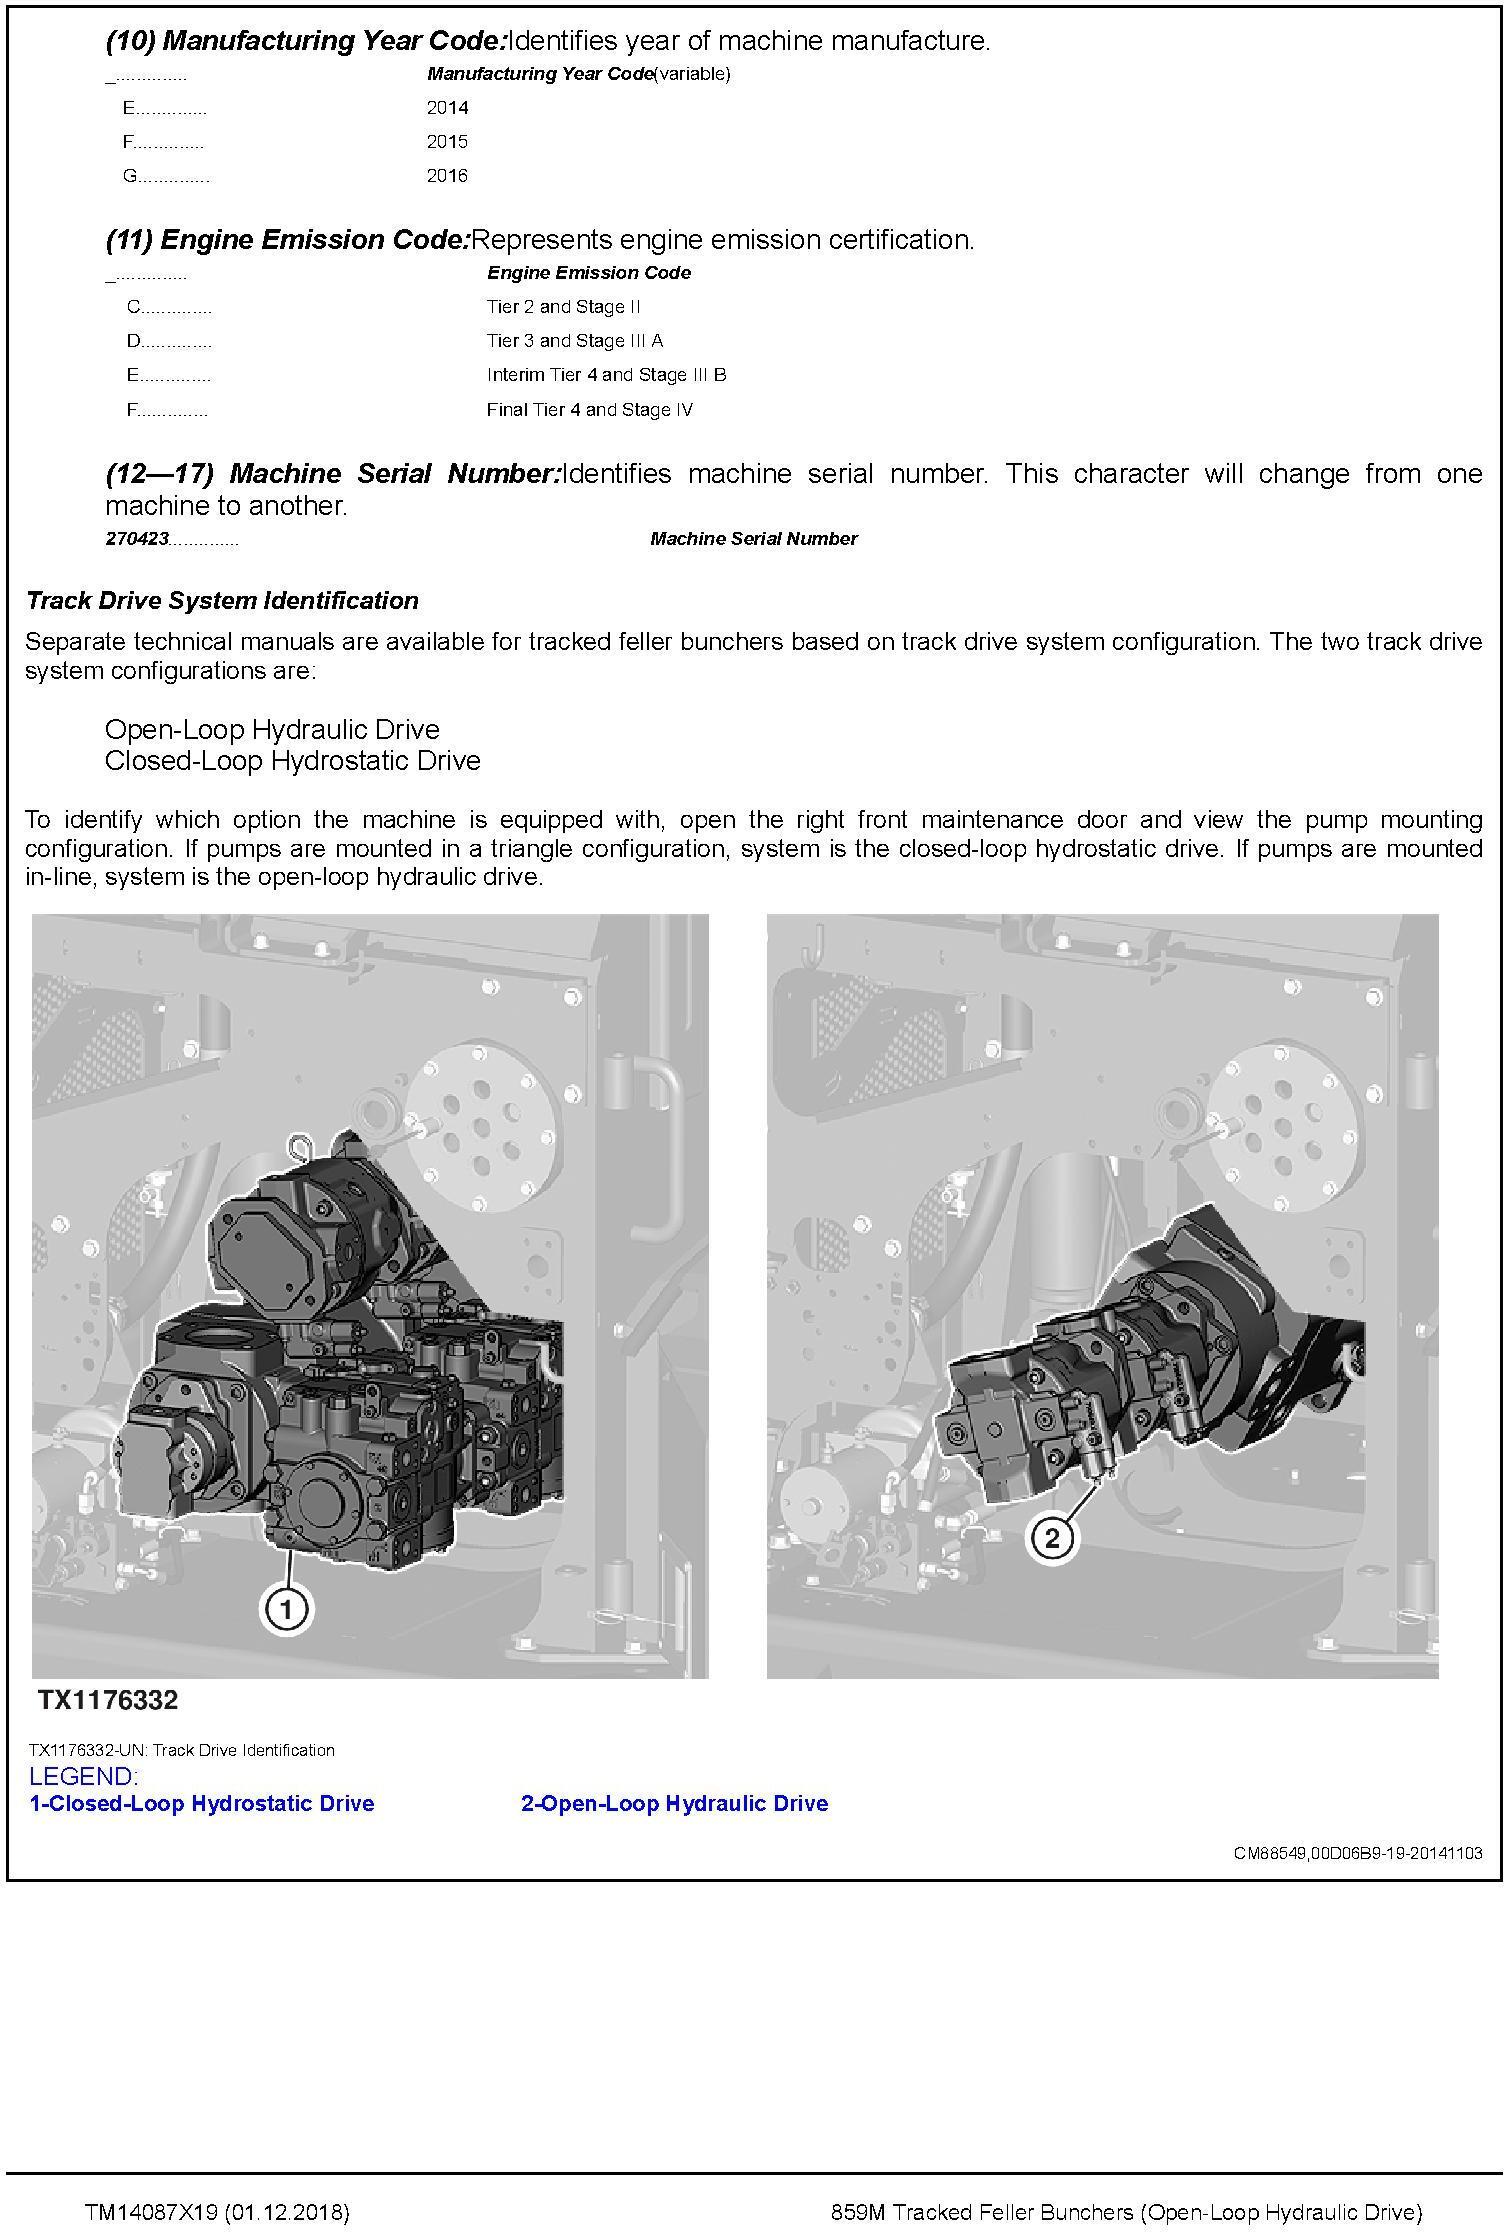 John Deere 859M (SN. F293917-, L343918-) Feller Bunchers (Open-Loop) Diagnostic Manual (TM14087X19) - 1